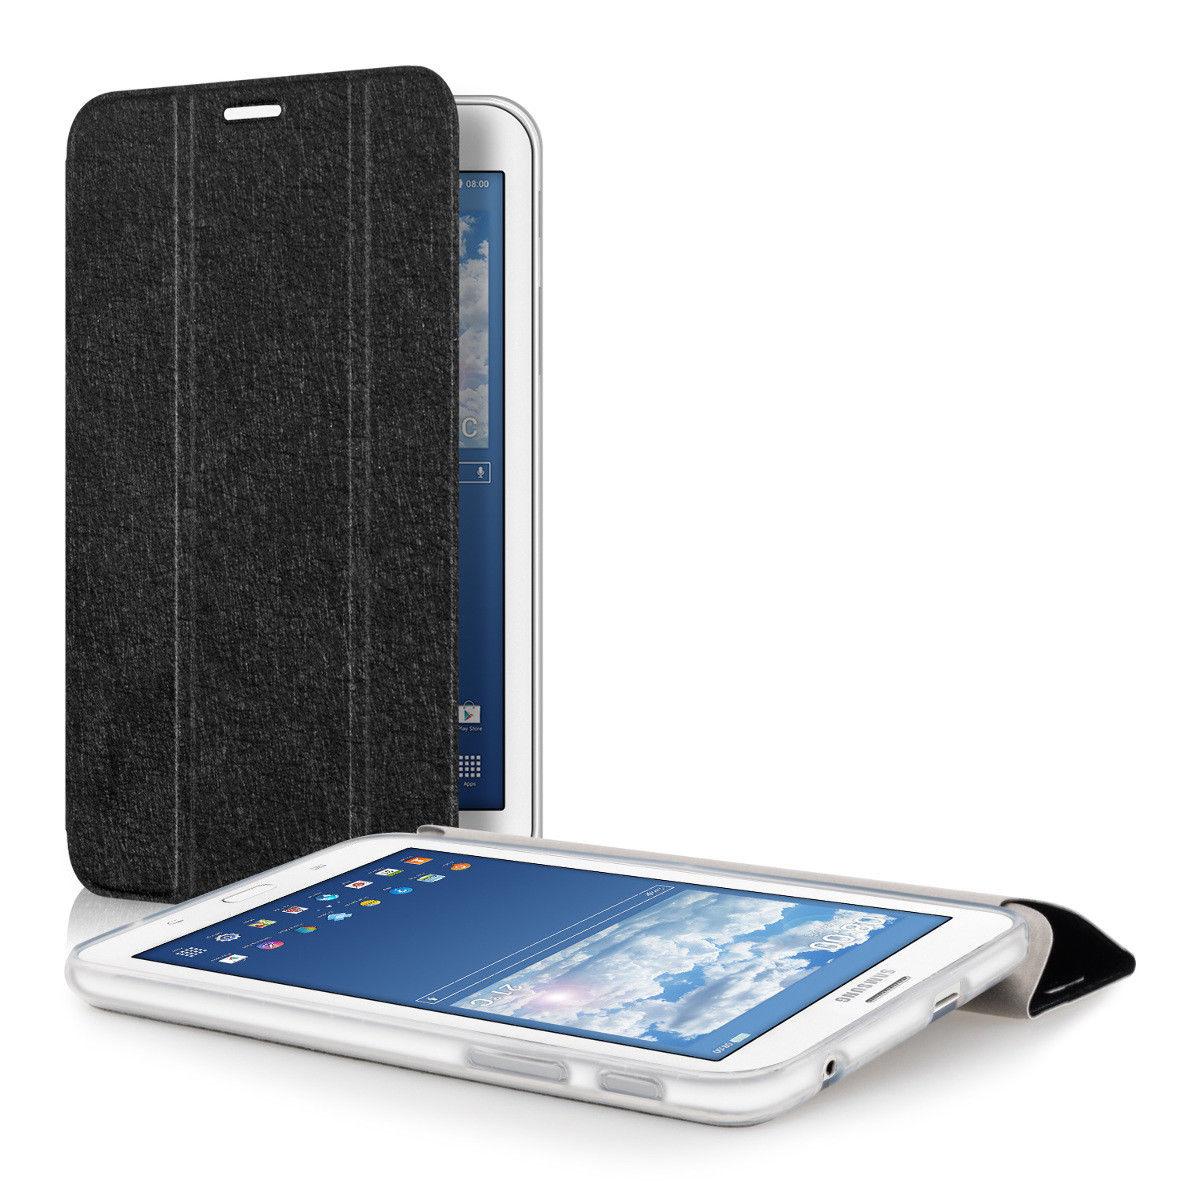 Pouzdro pro Samsung Galaxy Tab 3 7.0 Lite černé